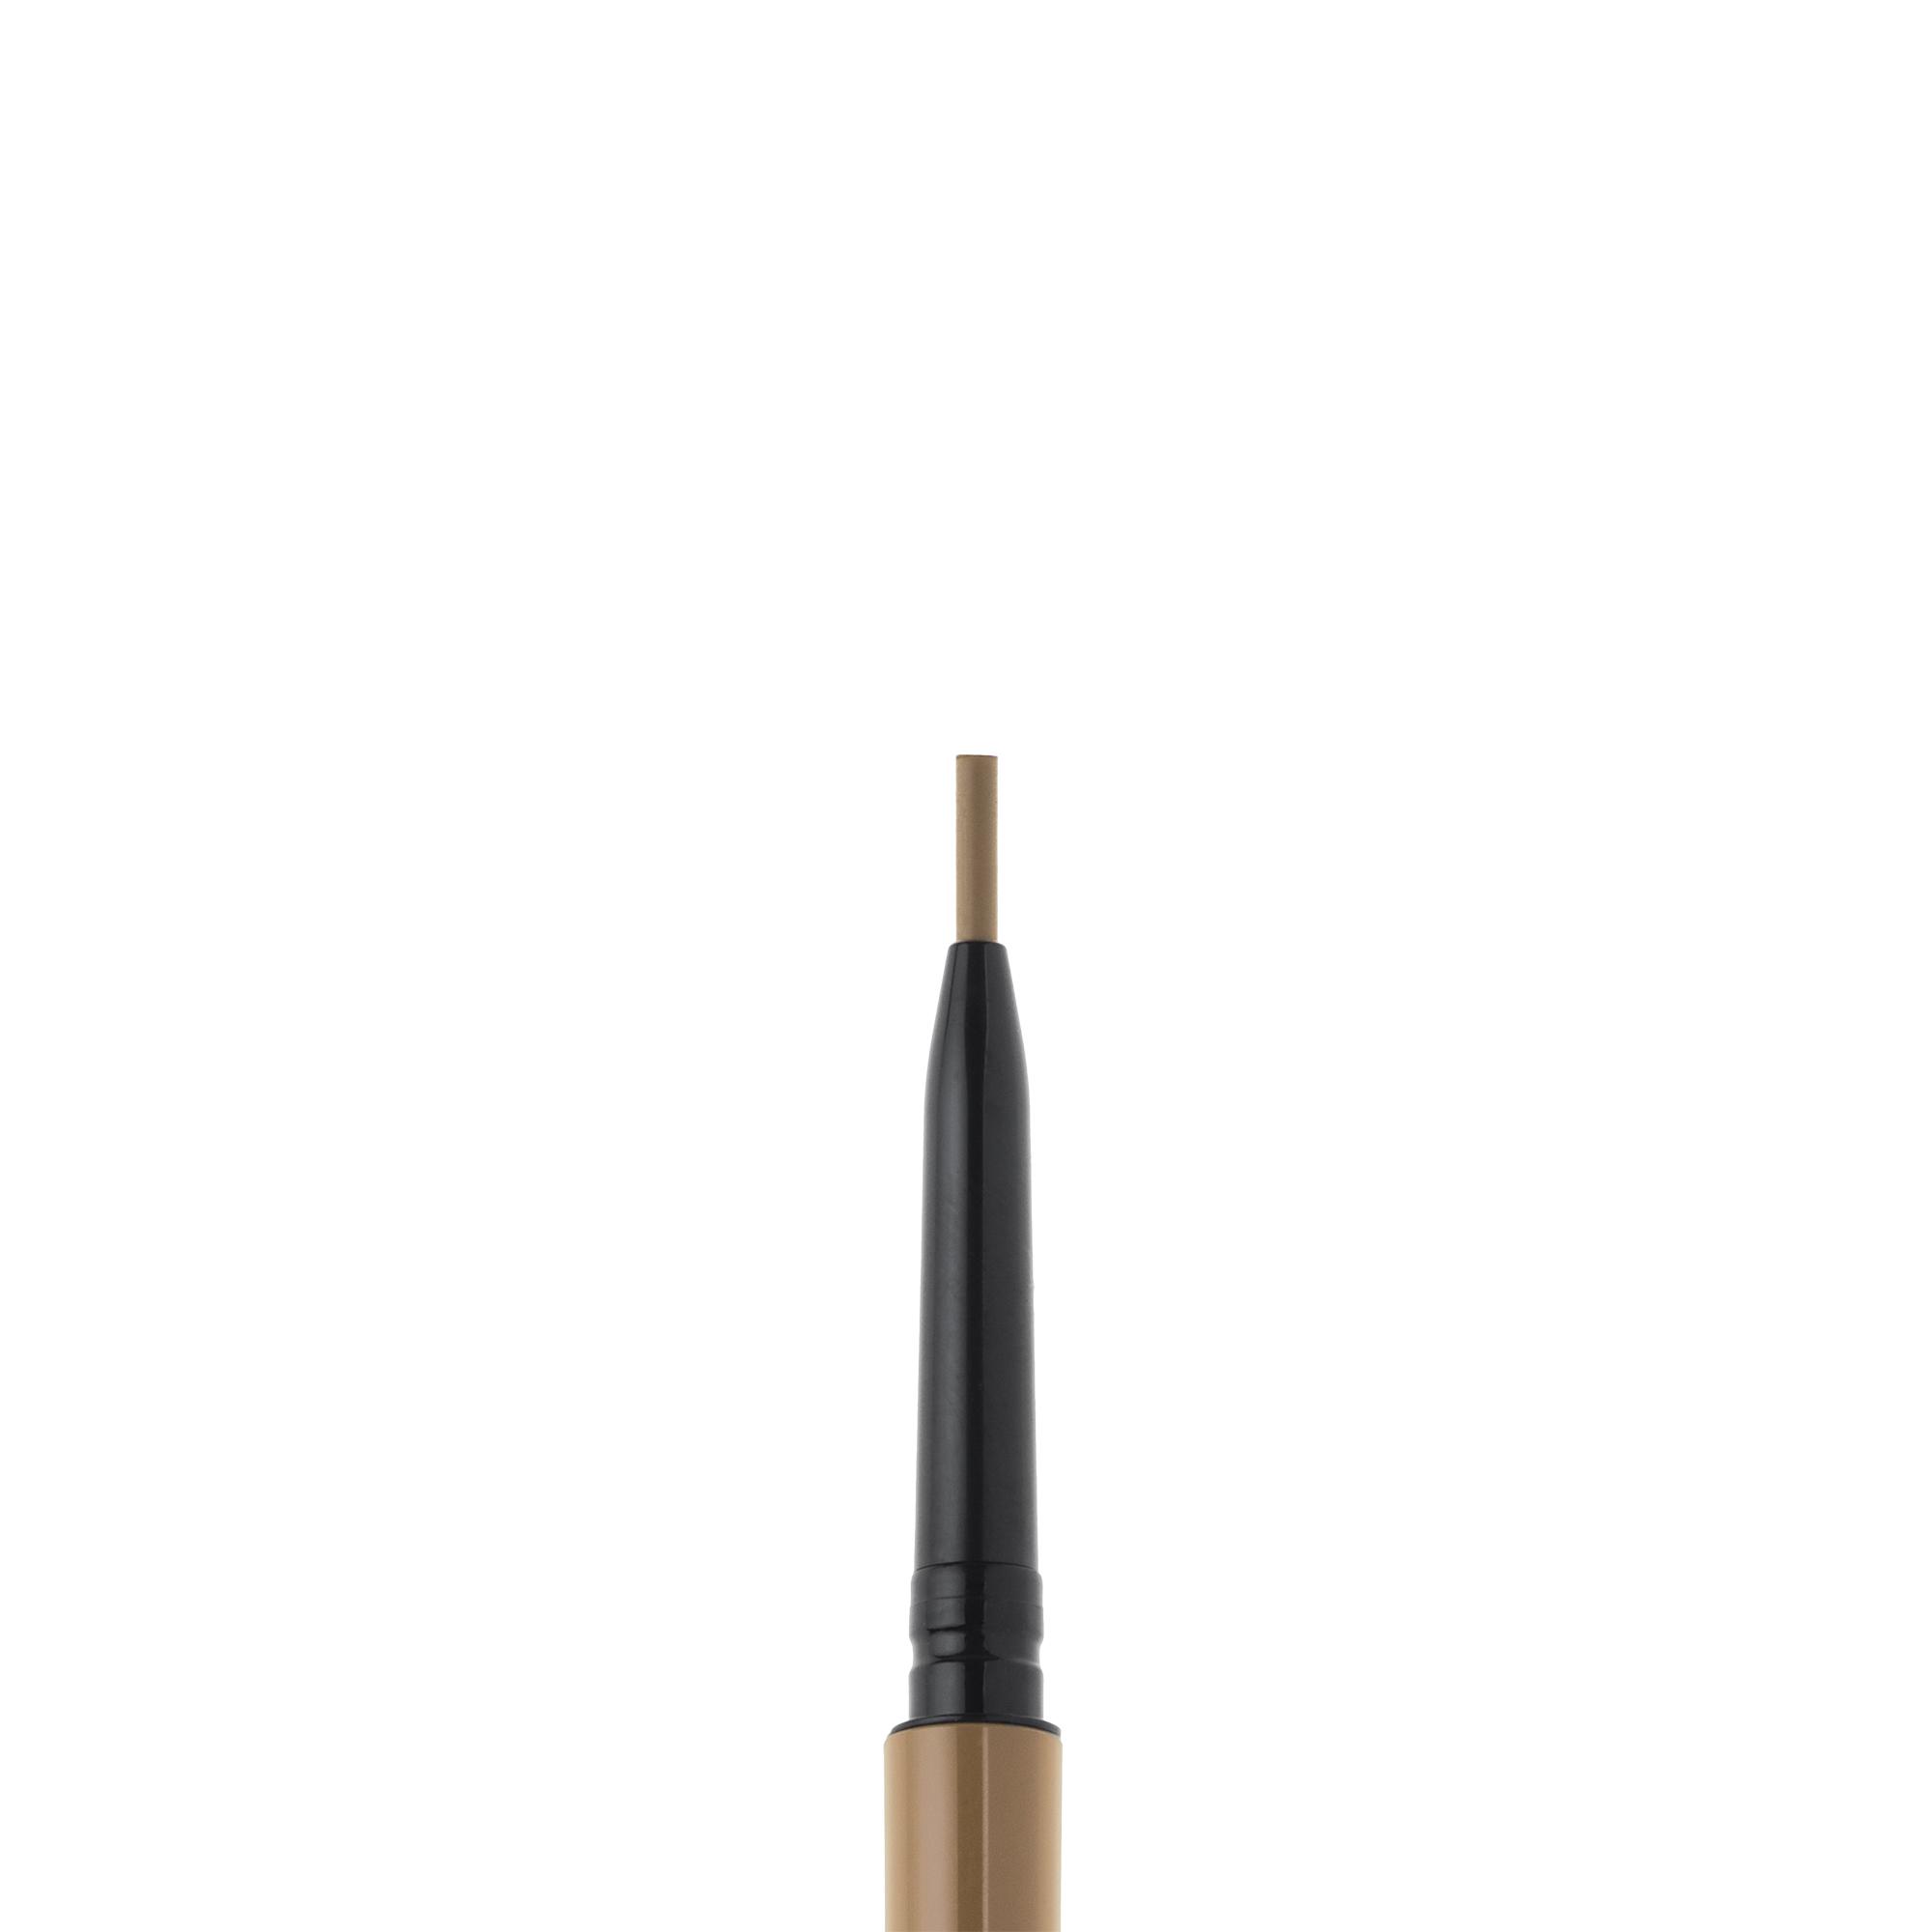 Lancôme Define Brow Pencil, 04 light brown